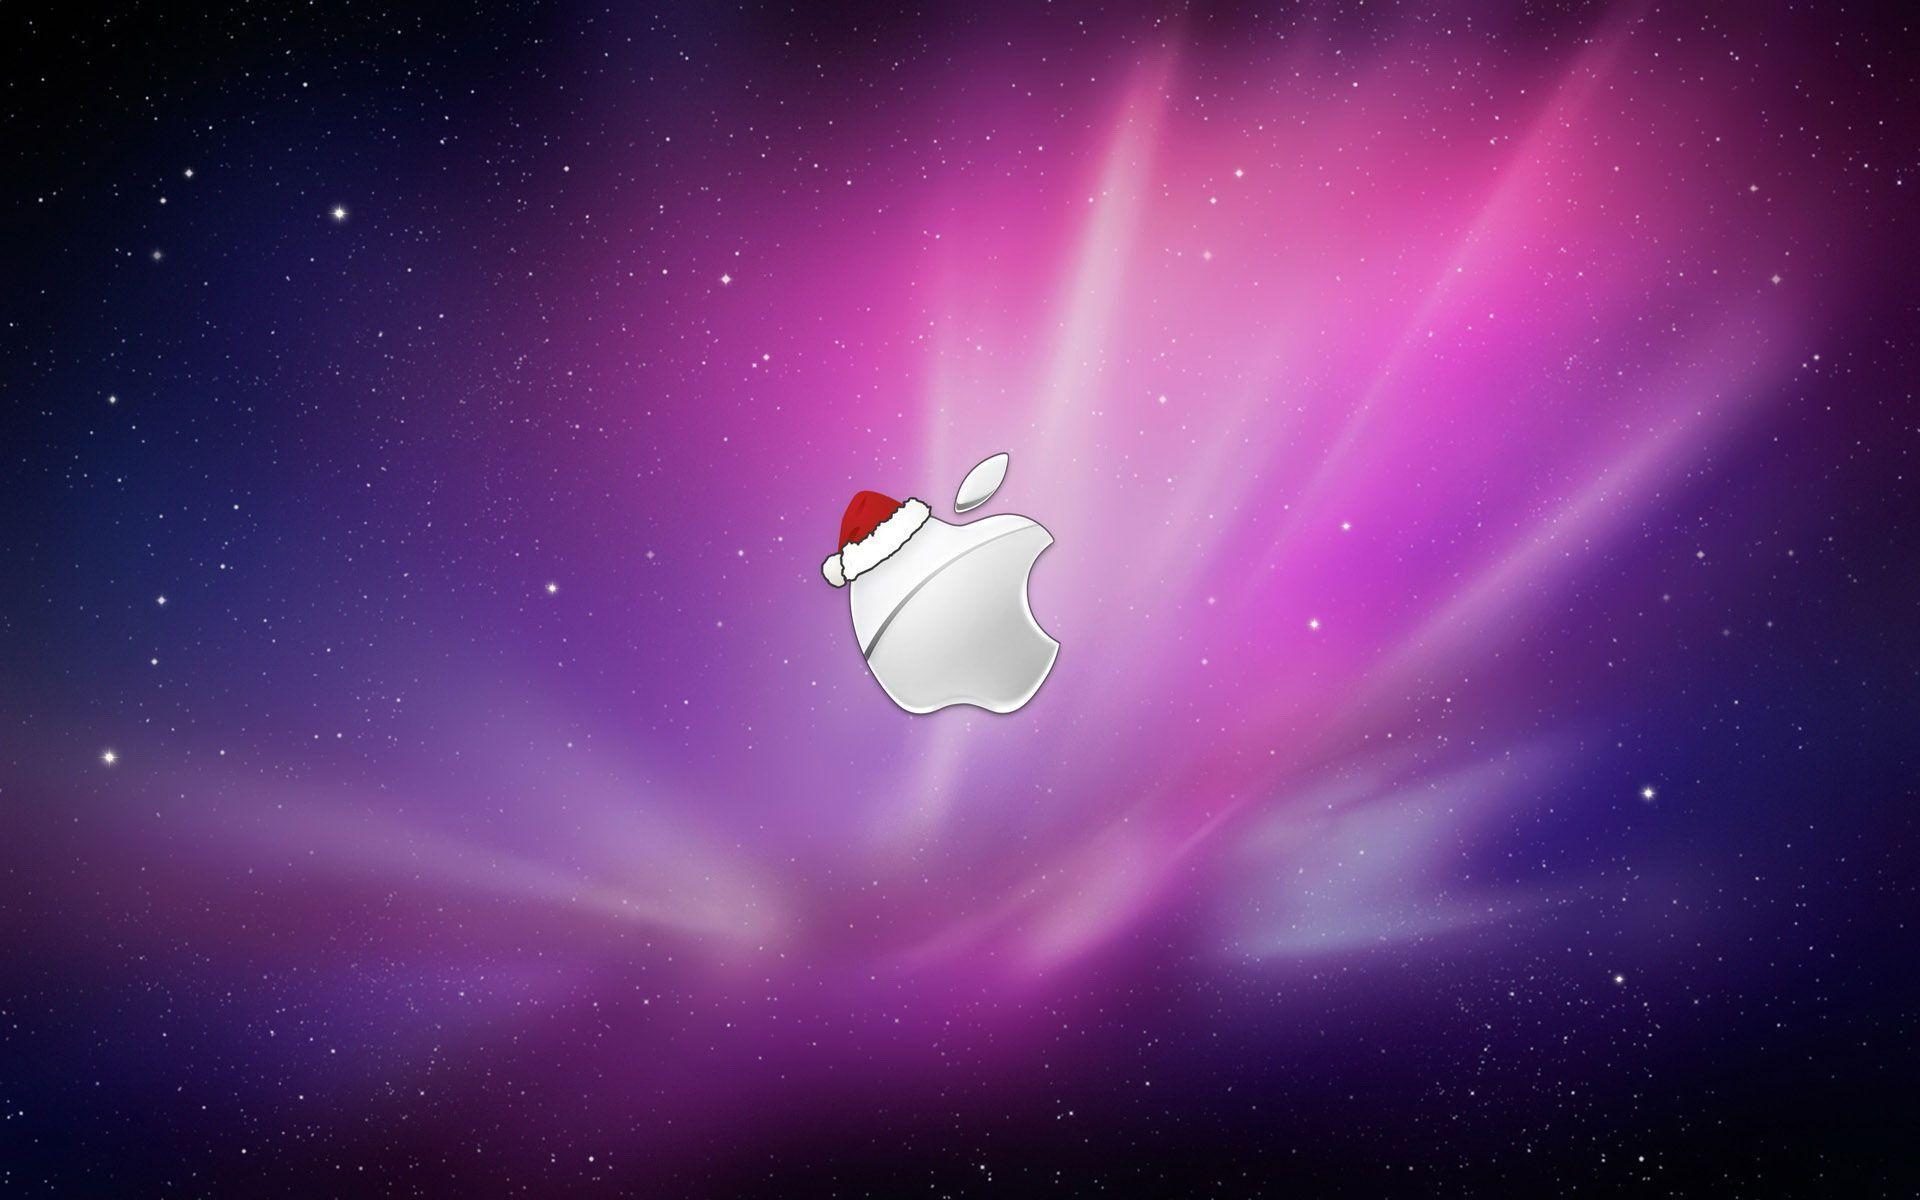 mac laptop backgrounds - wallpaper cave